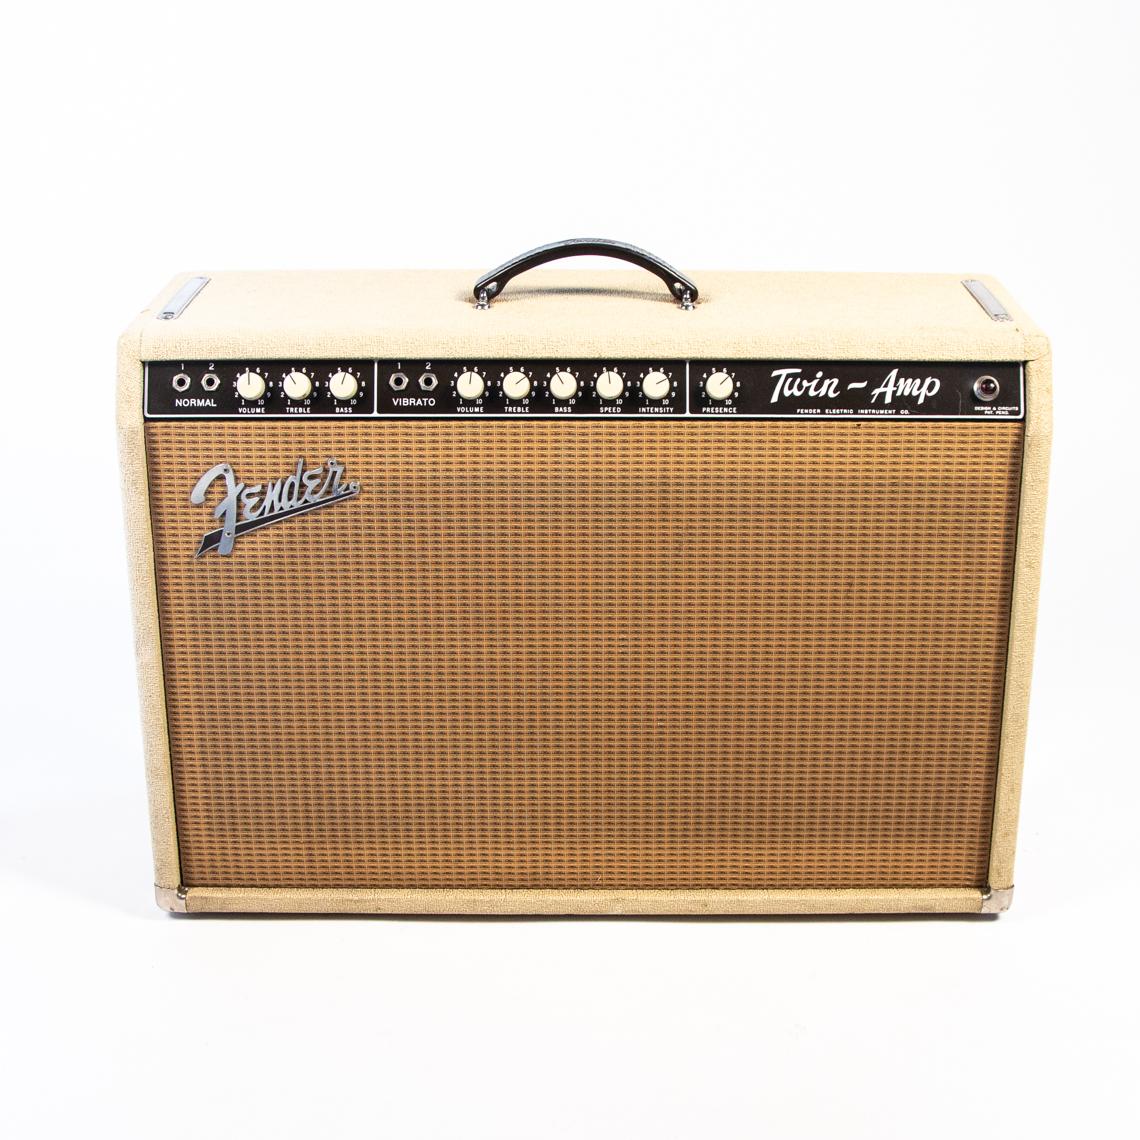 1962 Fender Twin-Amp